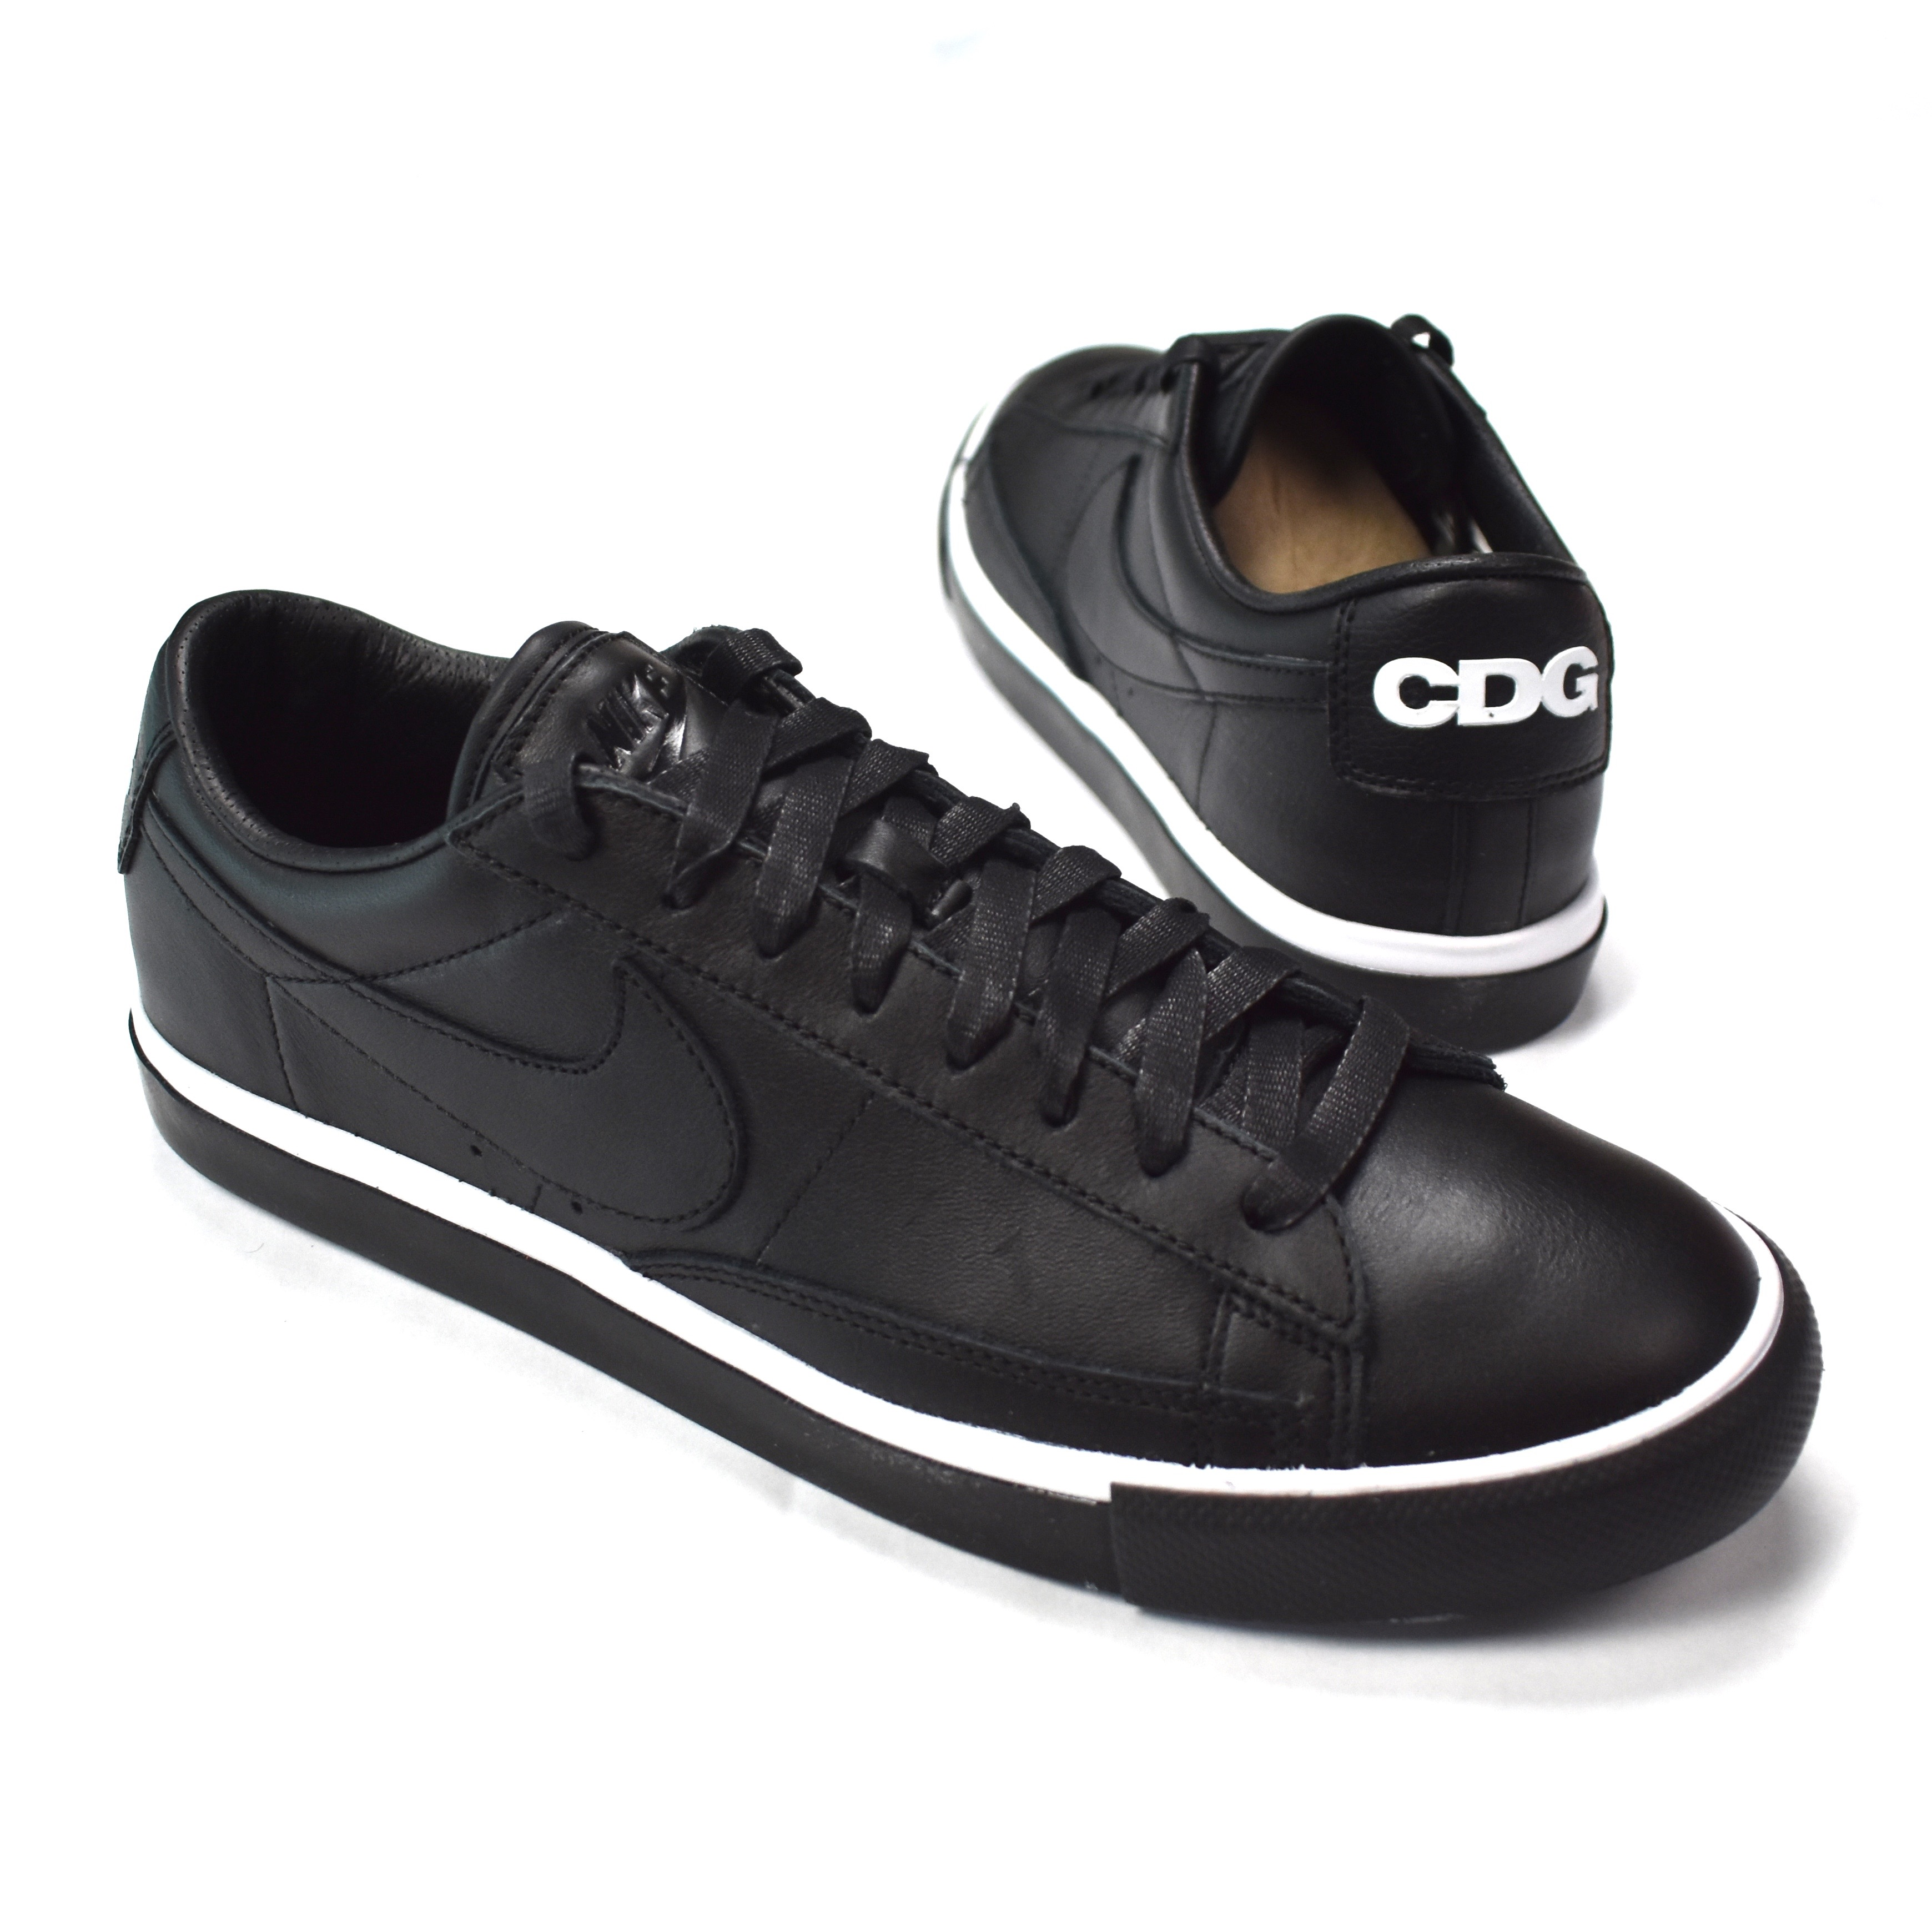 CDG Black Blazer Low Sneakers DS